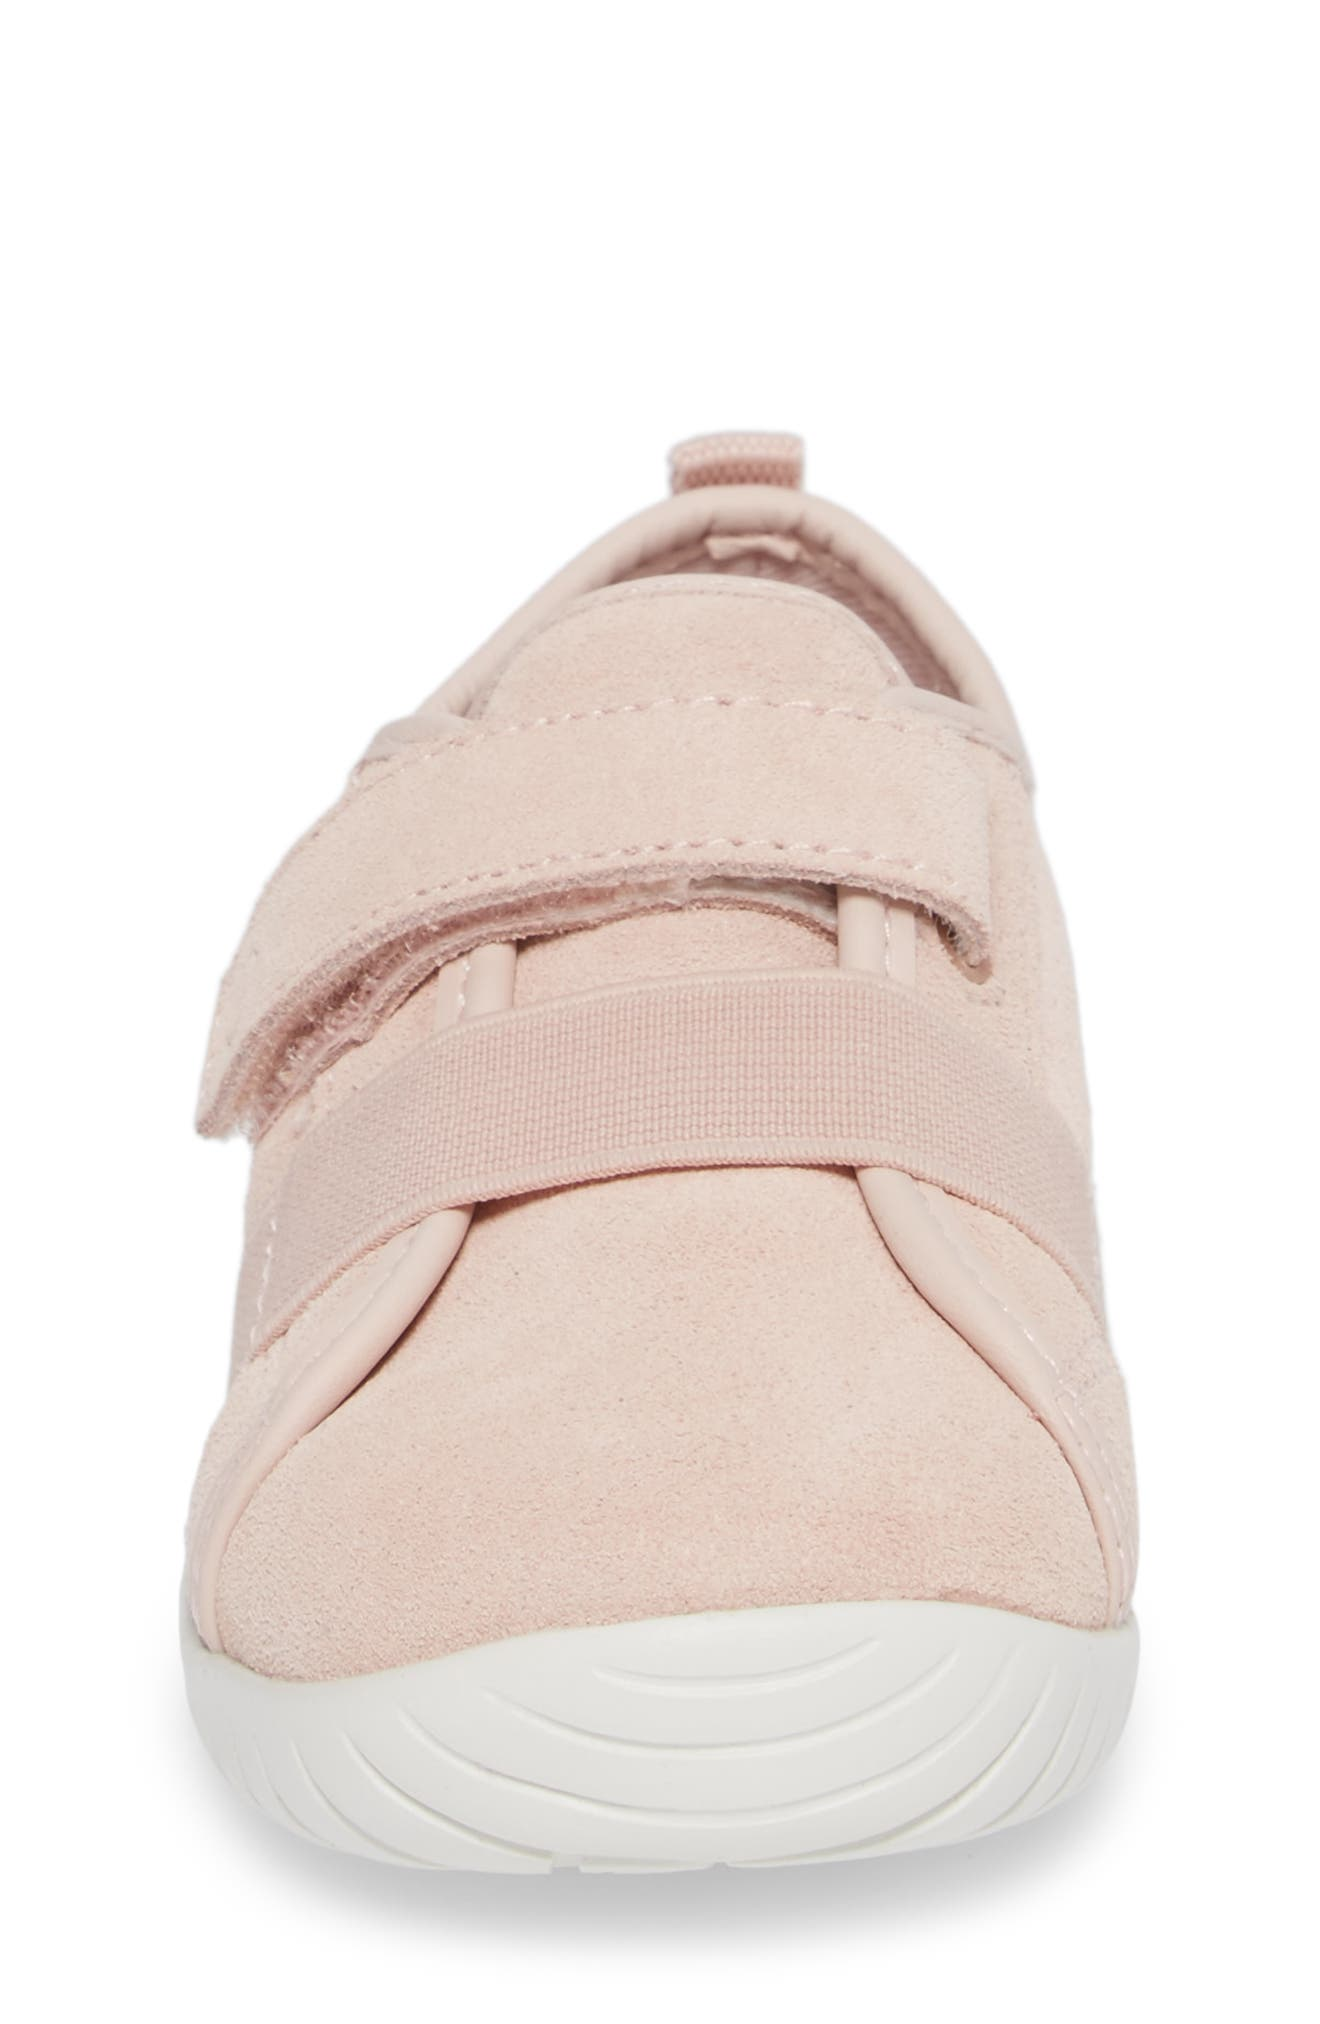 SRtech<sup>™</sup> Riley Sneaker,                             Alternate thumbnail 4, color,                             Blush Leather